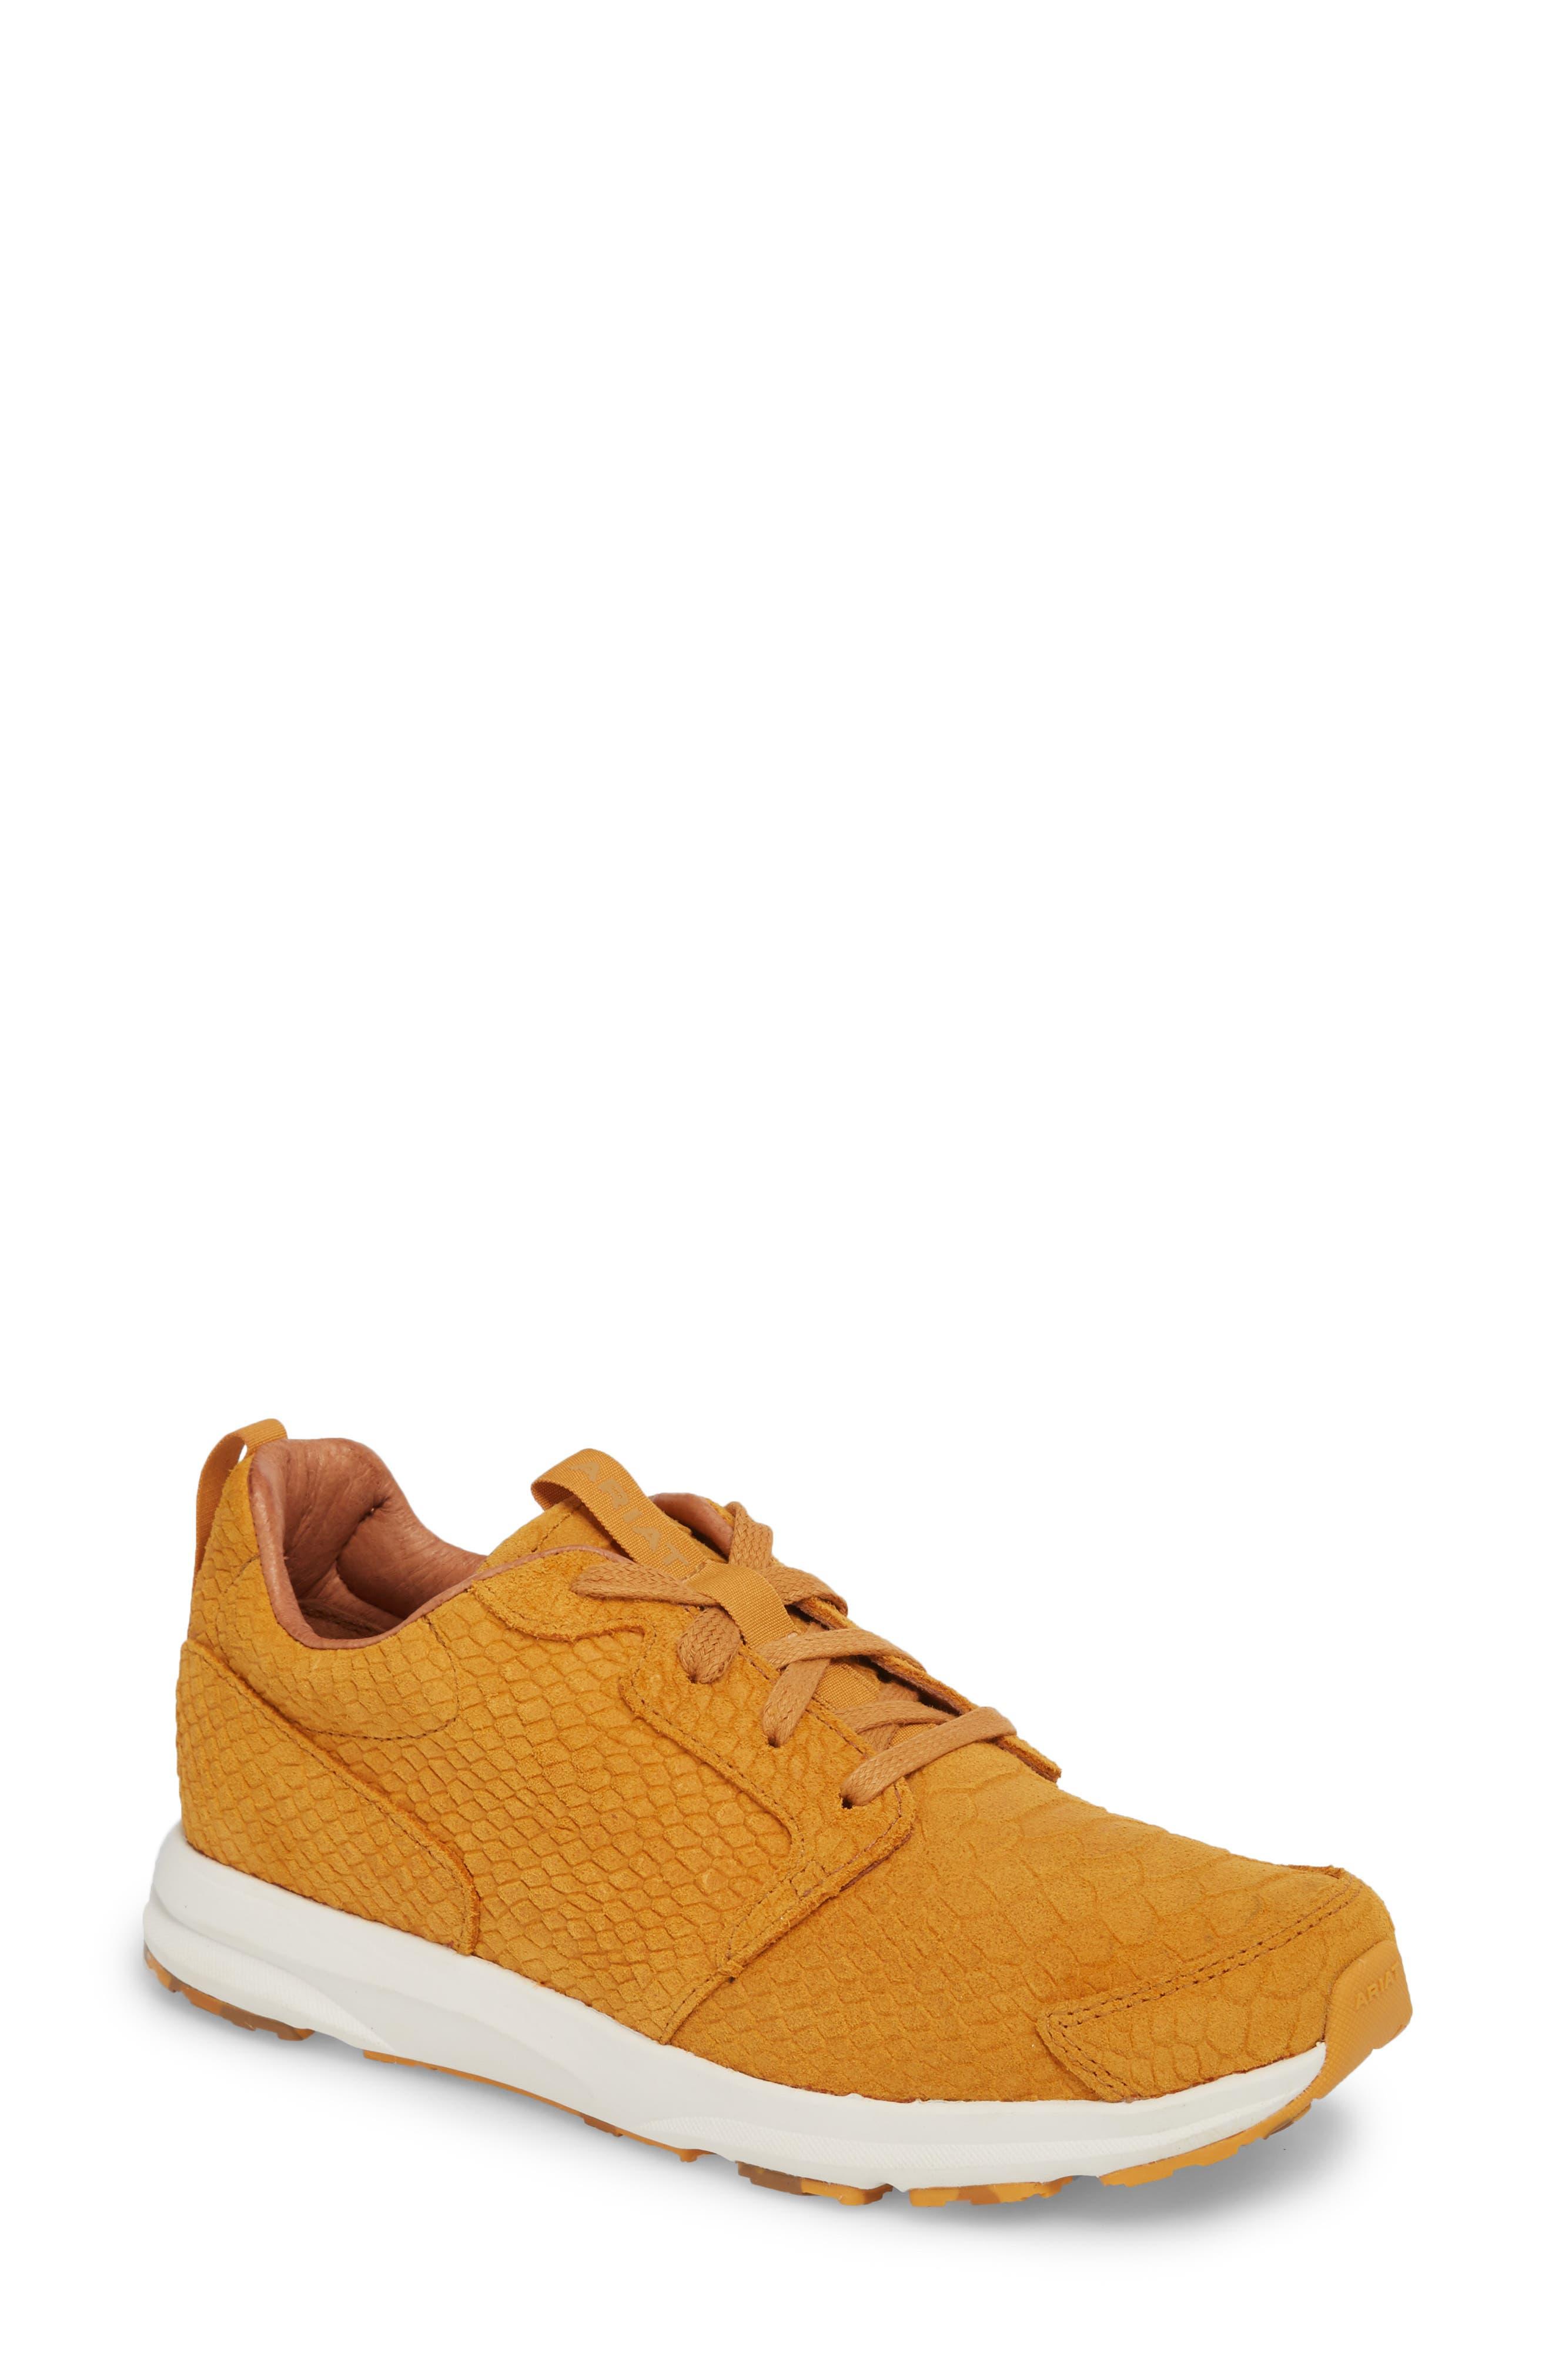 Fusion Sneaker,                             Main thumbnail 1, color,                             700